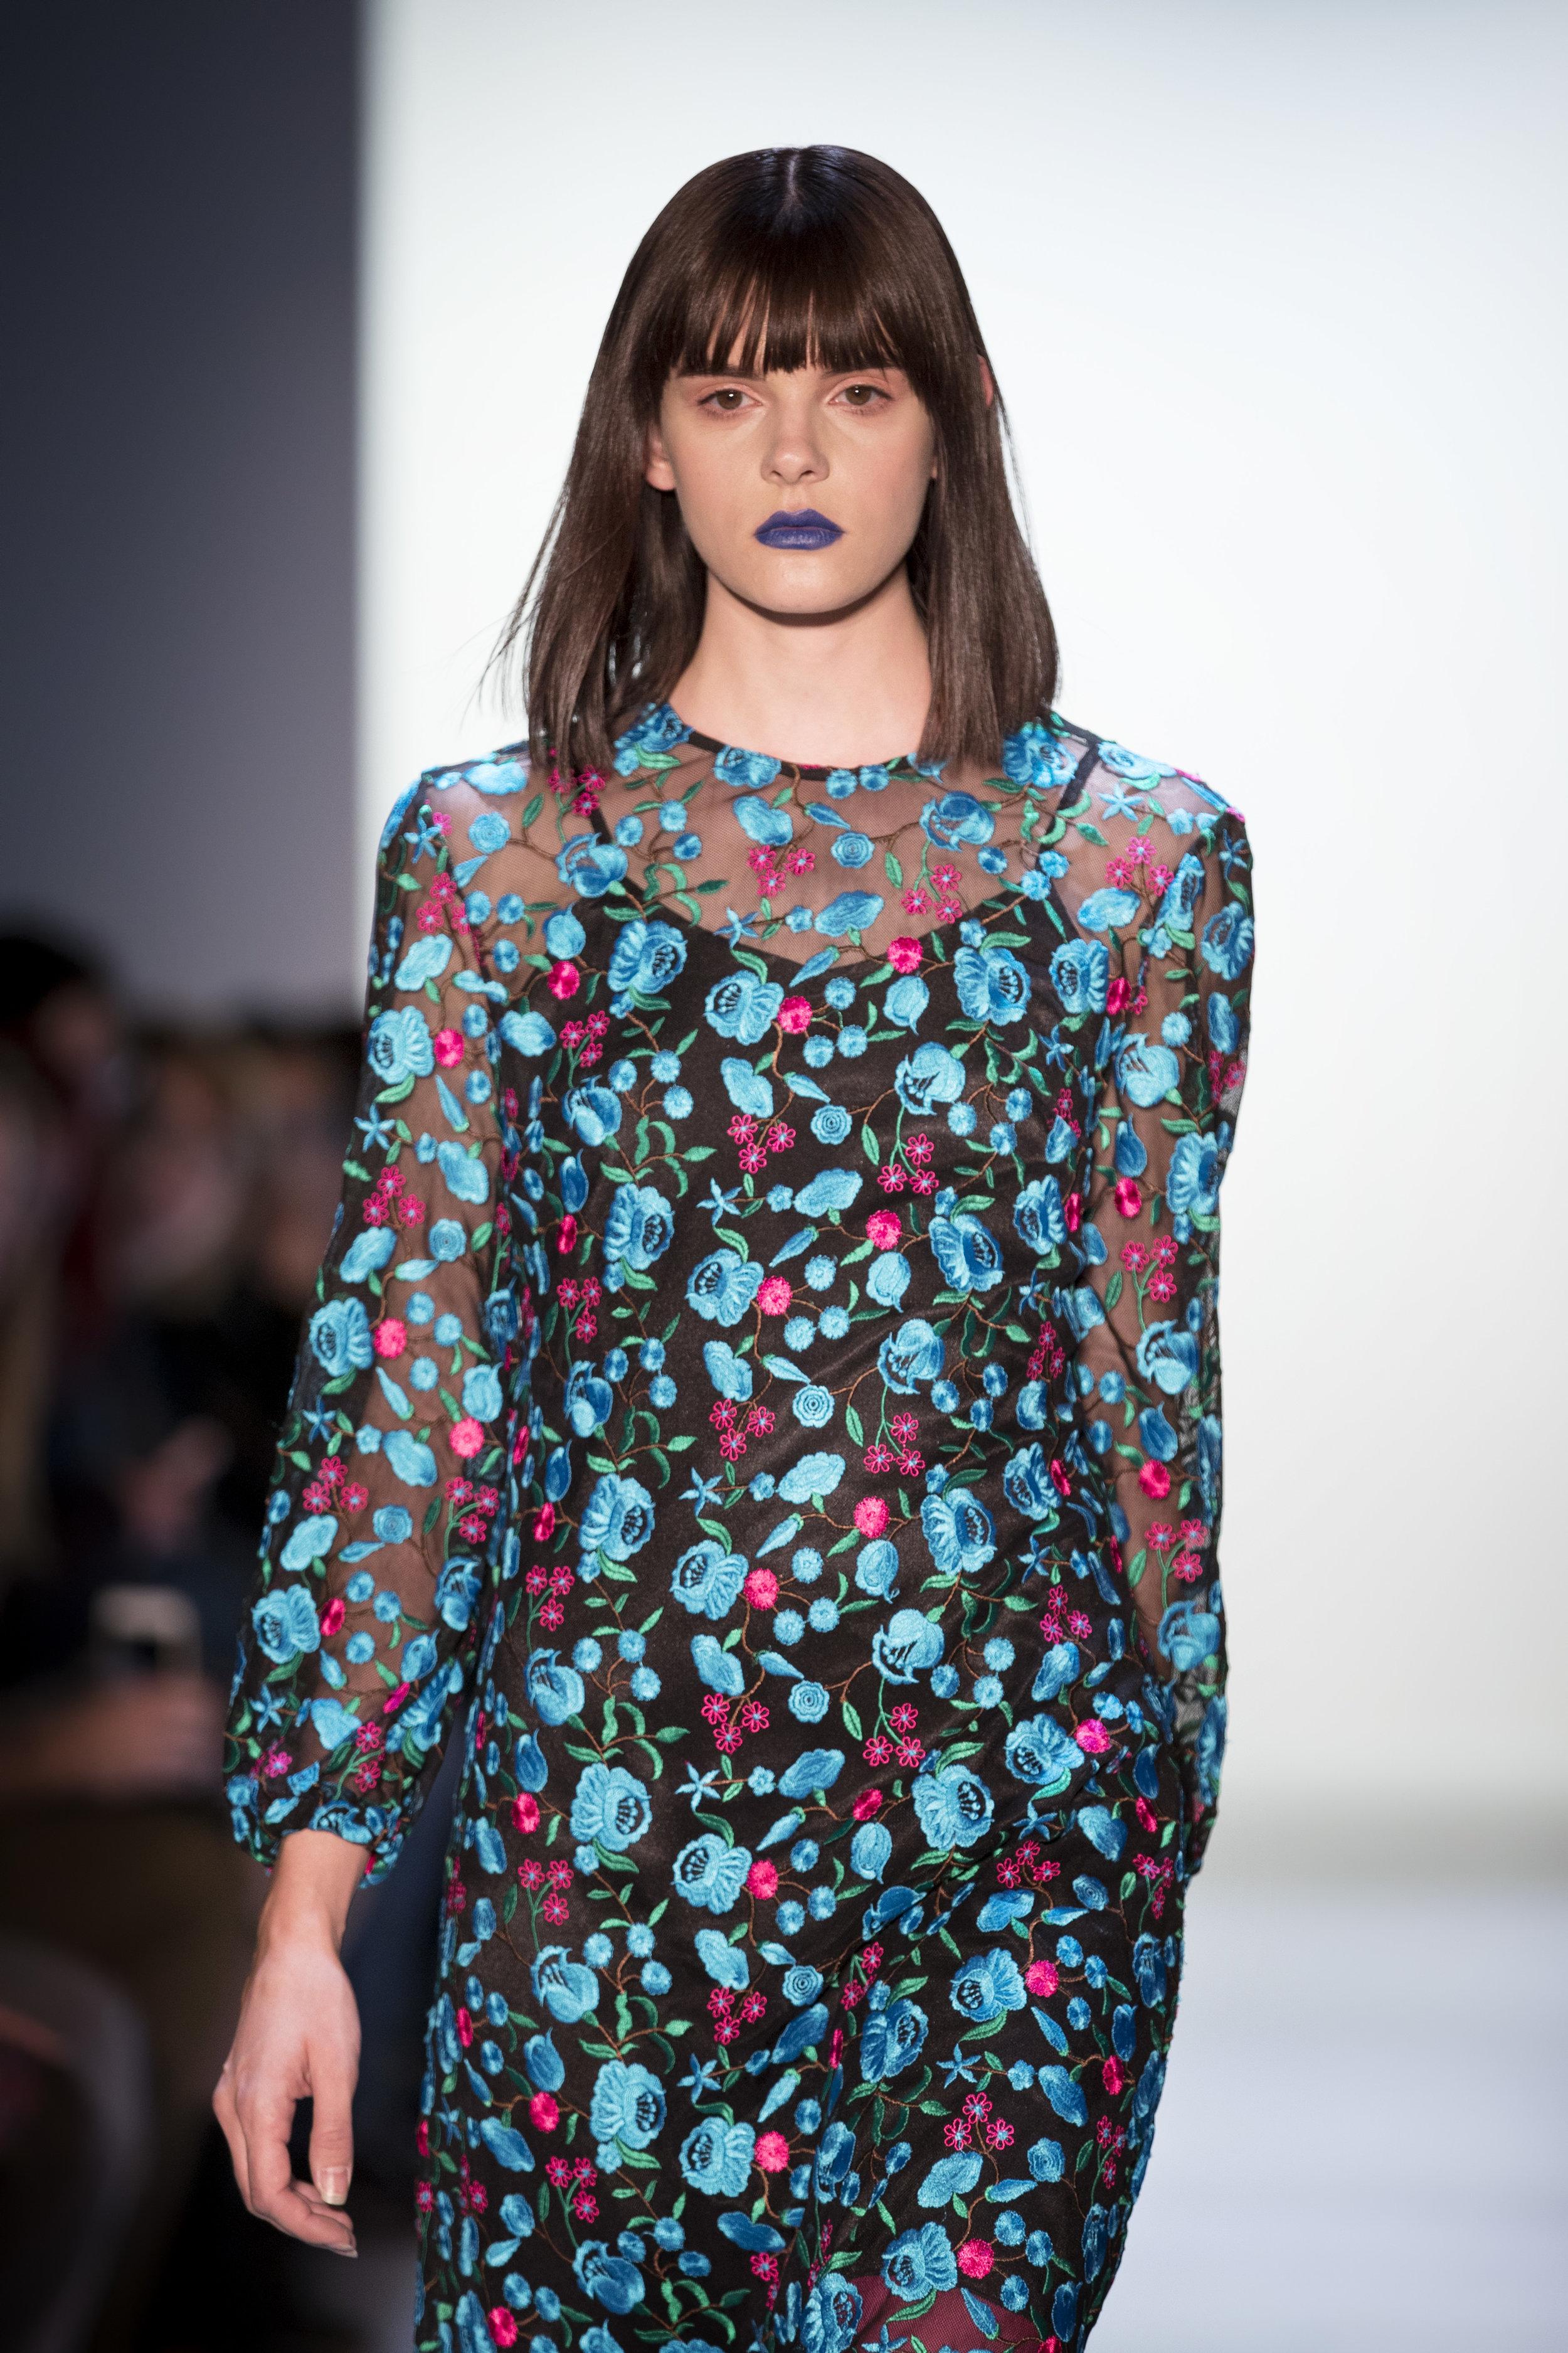 Massif Fashion Week 2017 Day 4 GIA New York Guillermo Irias - 013.jpg